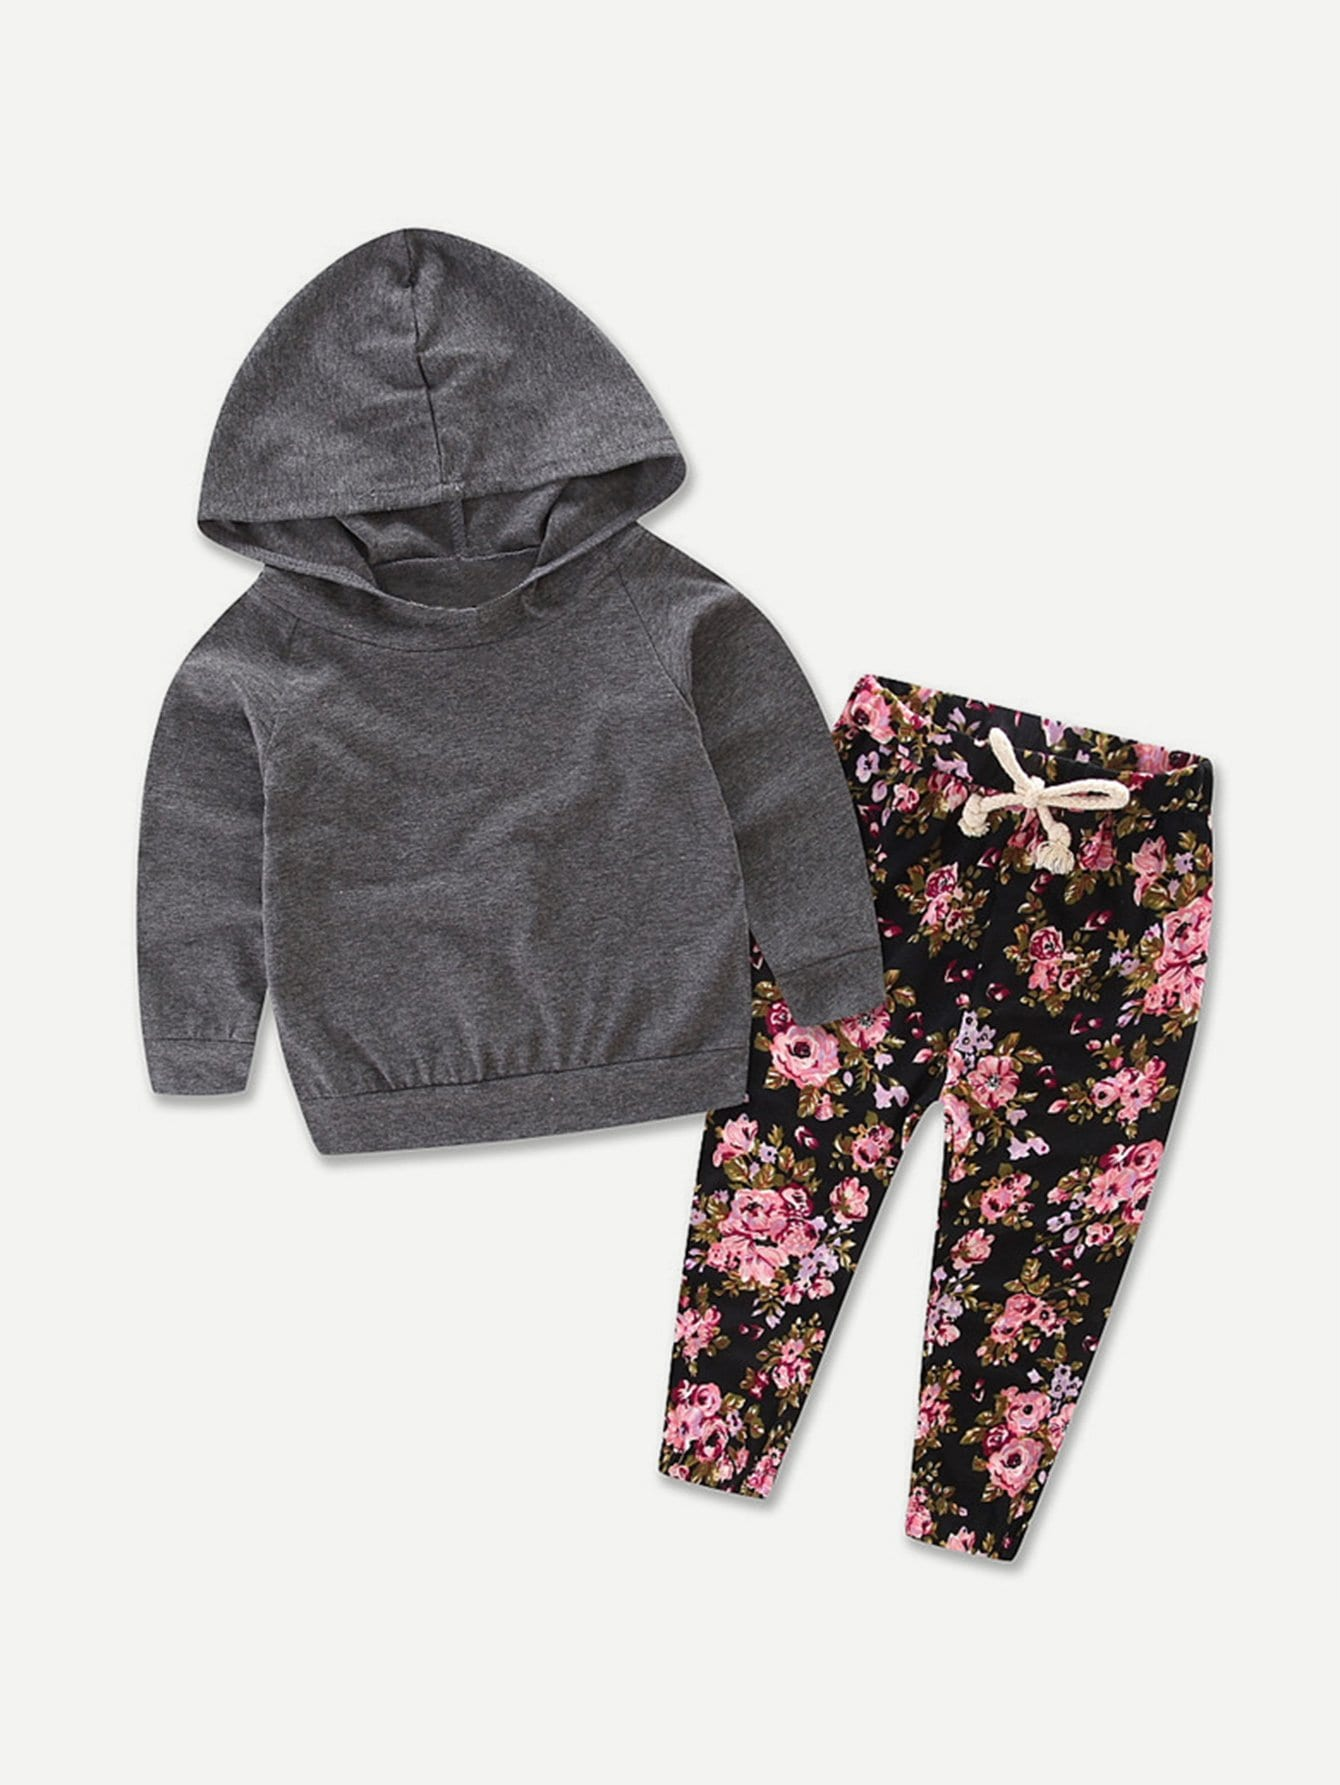 Hooded Sweatshirt With Drawstring Calico Print Pants alien print drop shoulder hooded drawstring sweatshirt